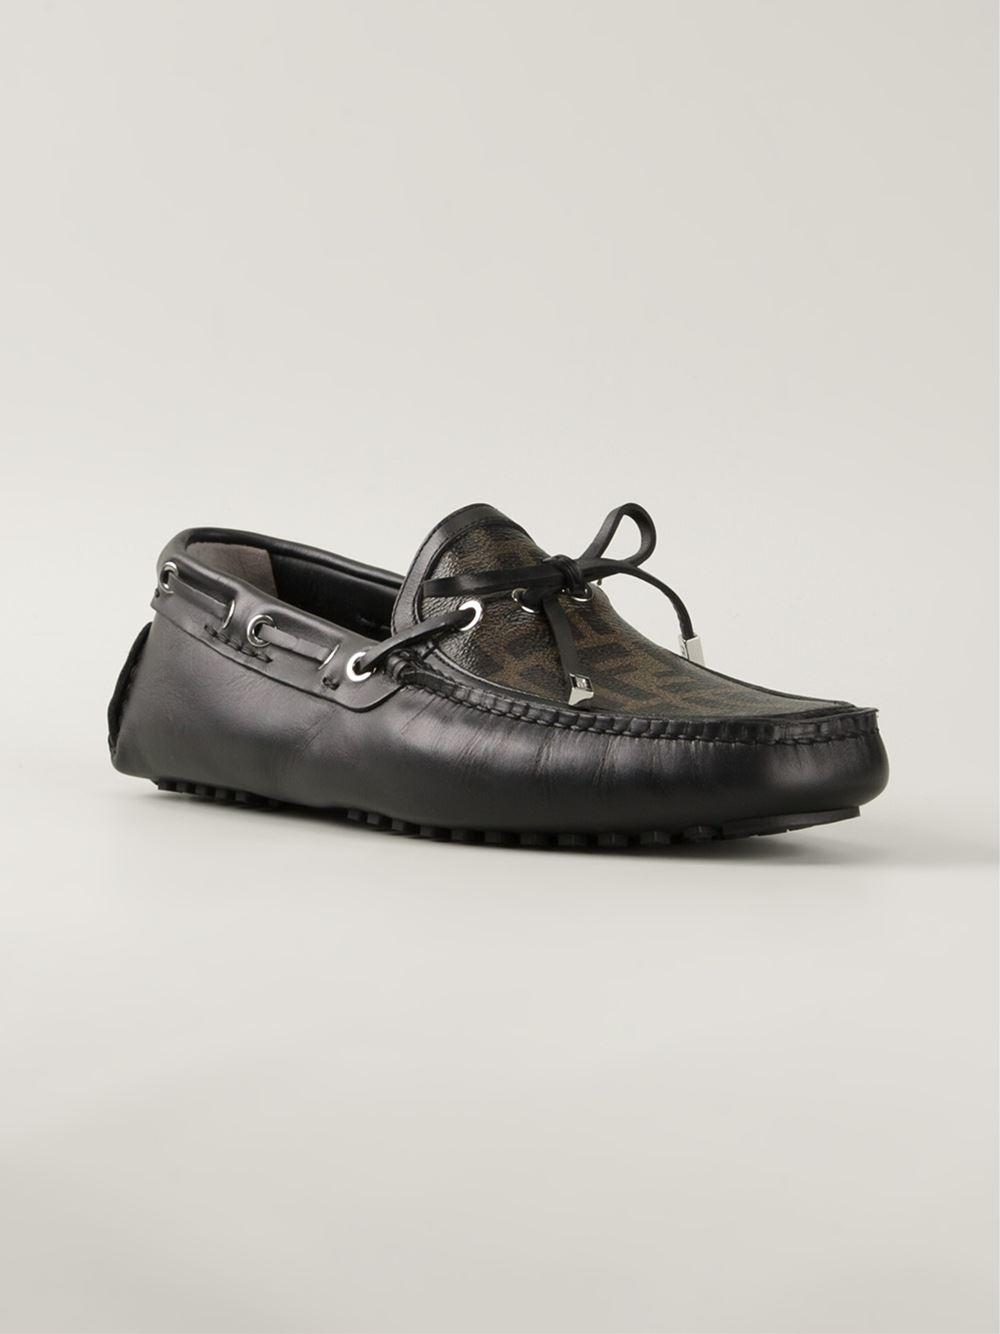 a59652c1d8 Lyst - Fendi Ff Logo Driving Shoes in Black for Men